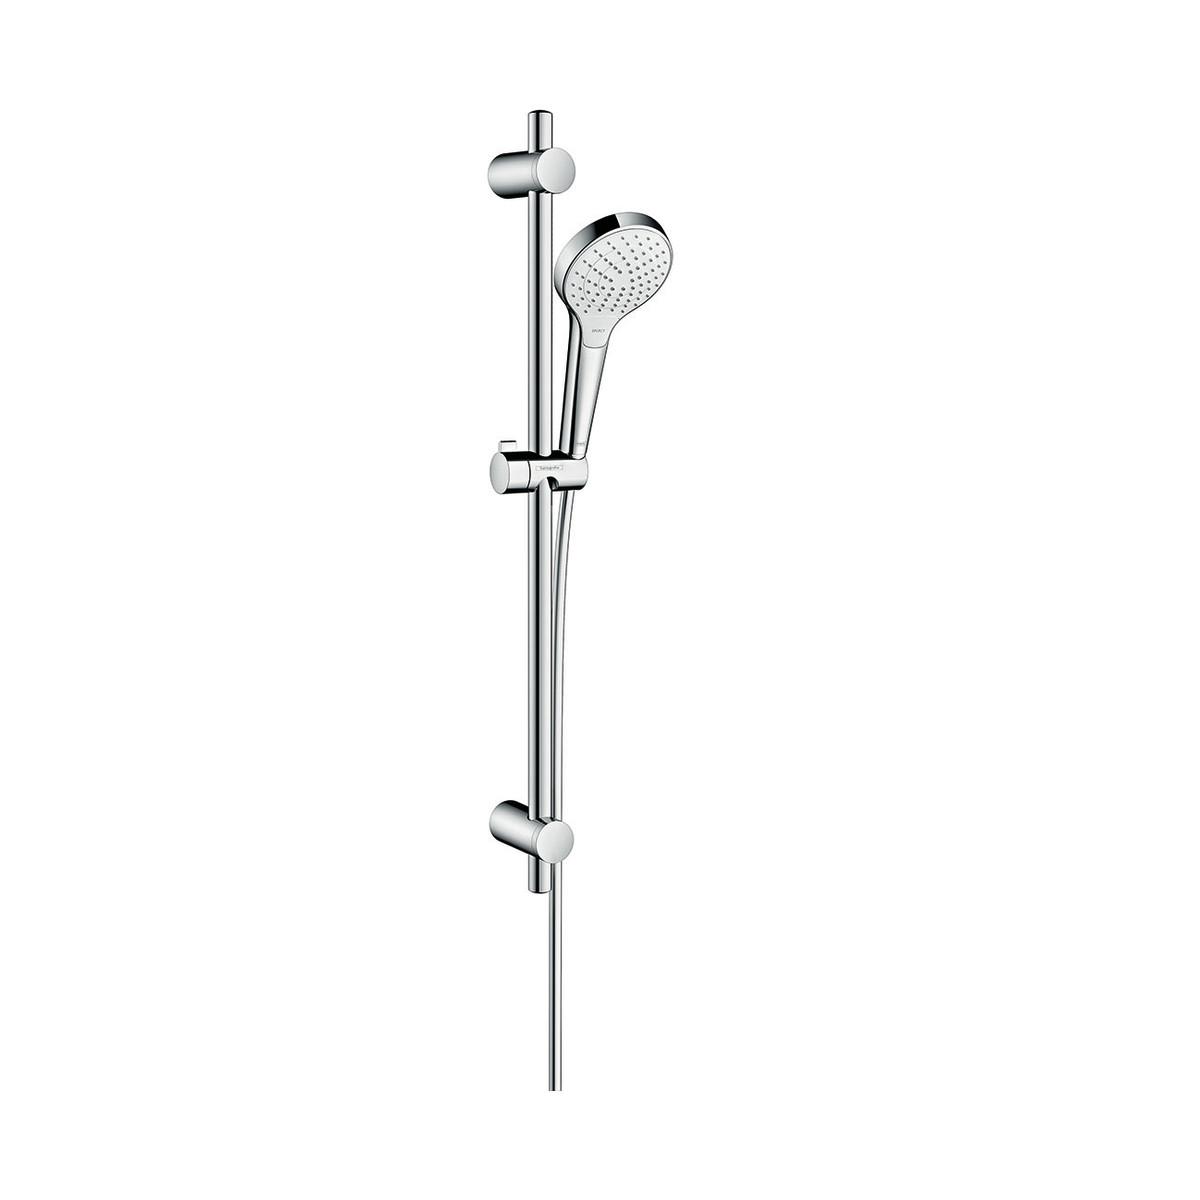 Hansgrohe pharo colonna doccia lift 2 a prezzo e offerte for Flessibile leroy merlin